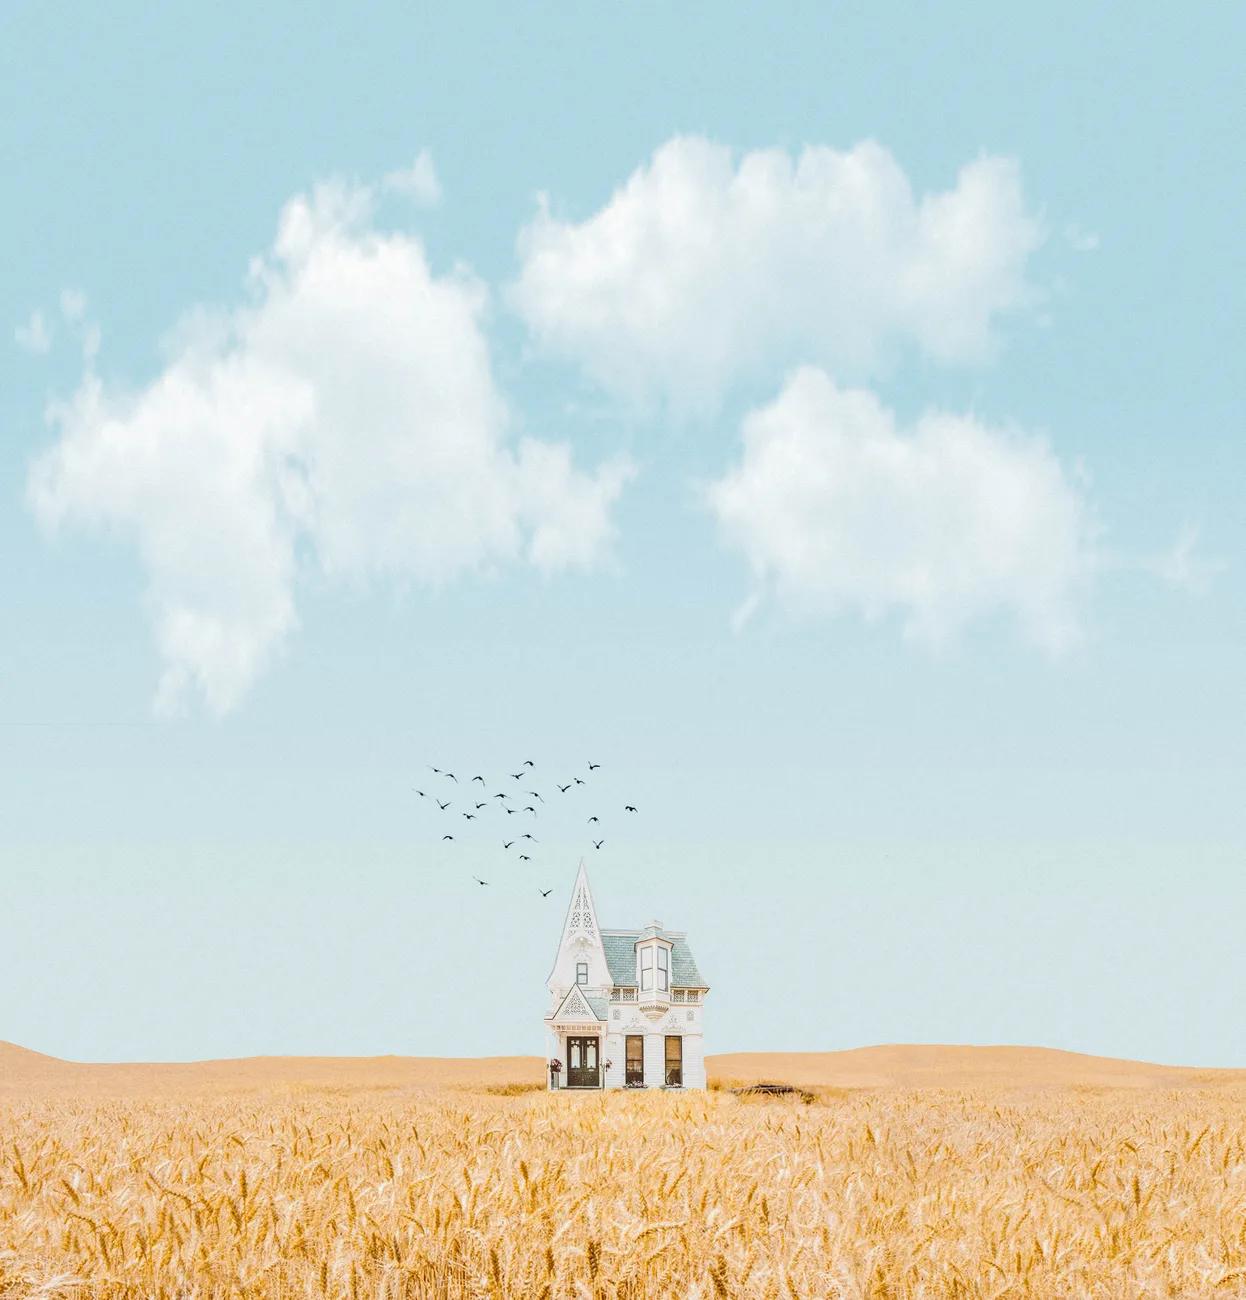 vast sky scene with house